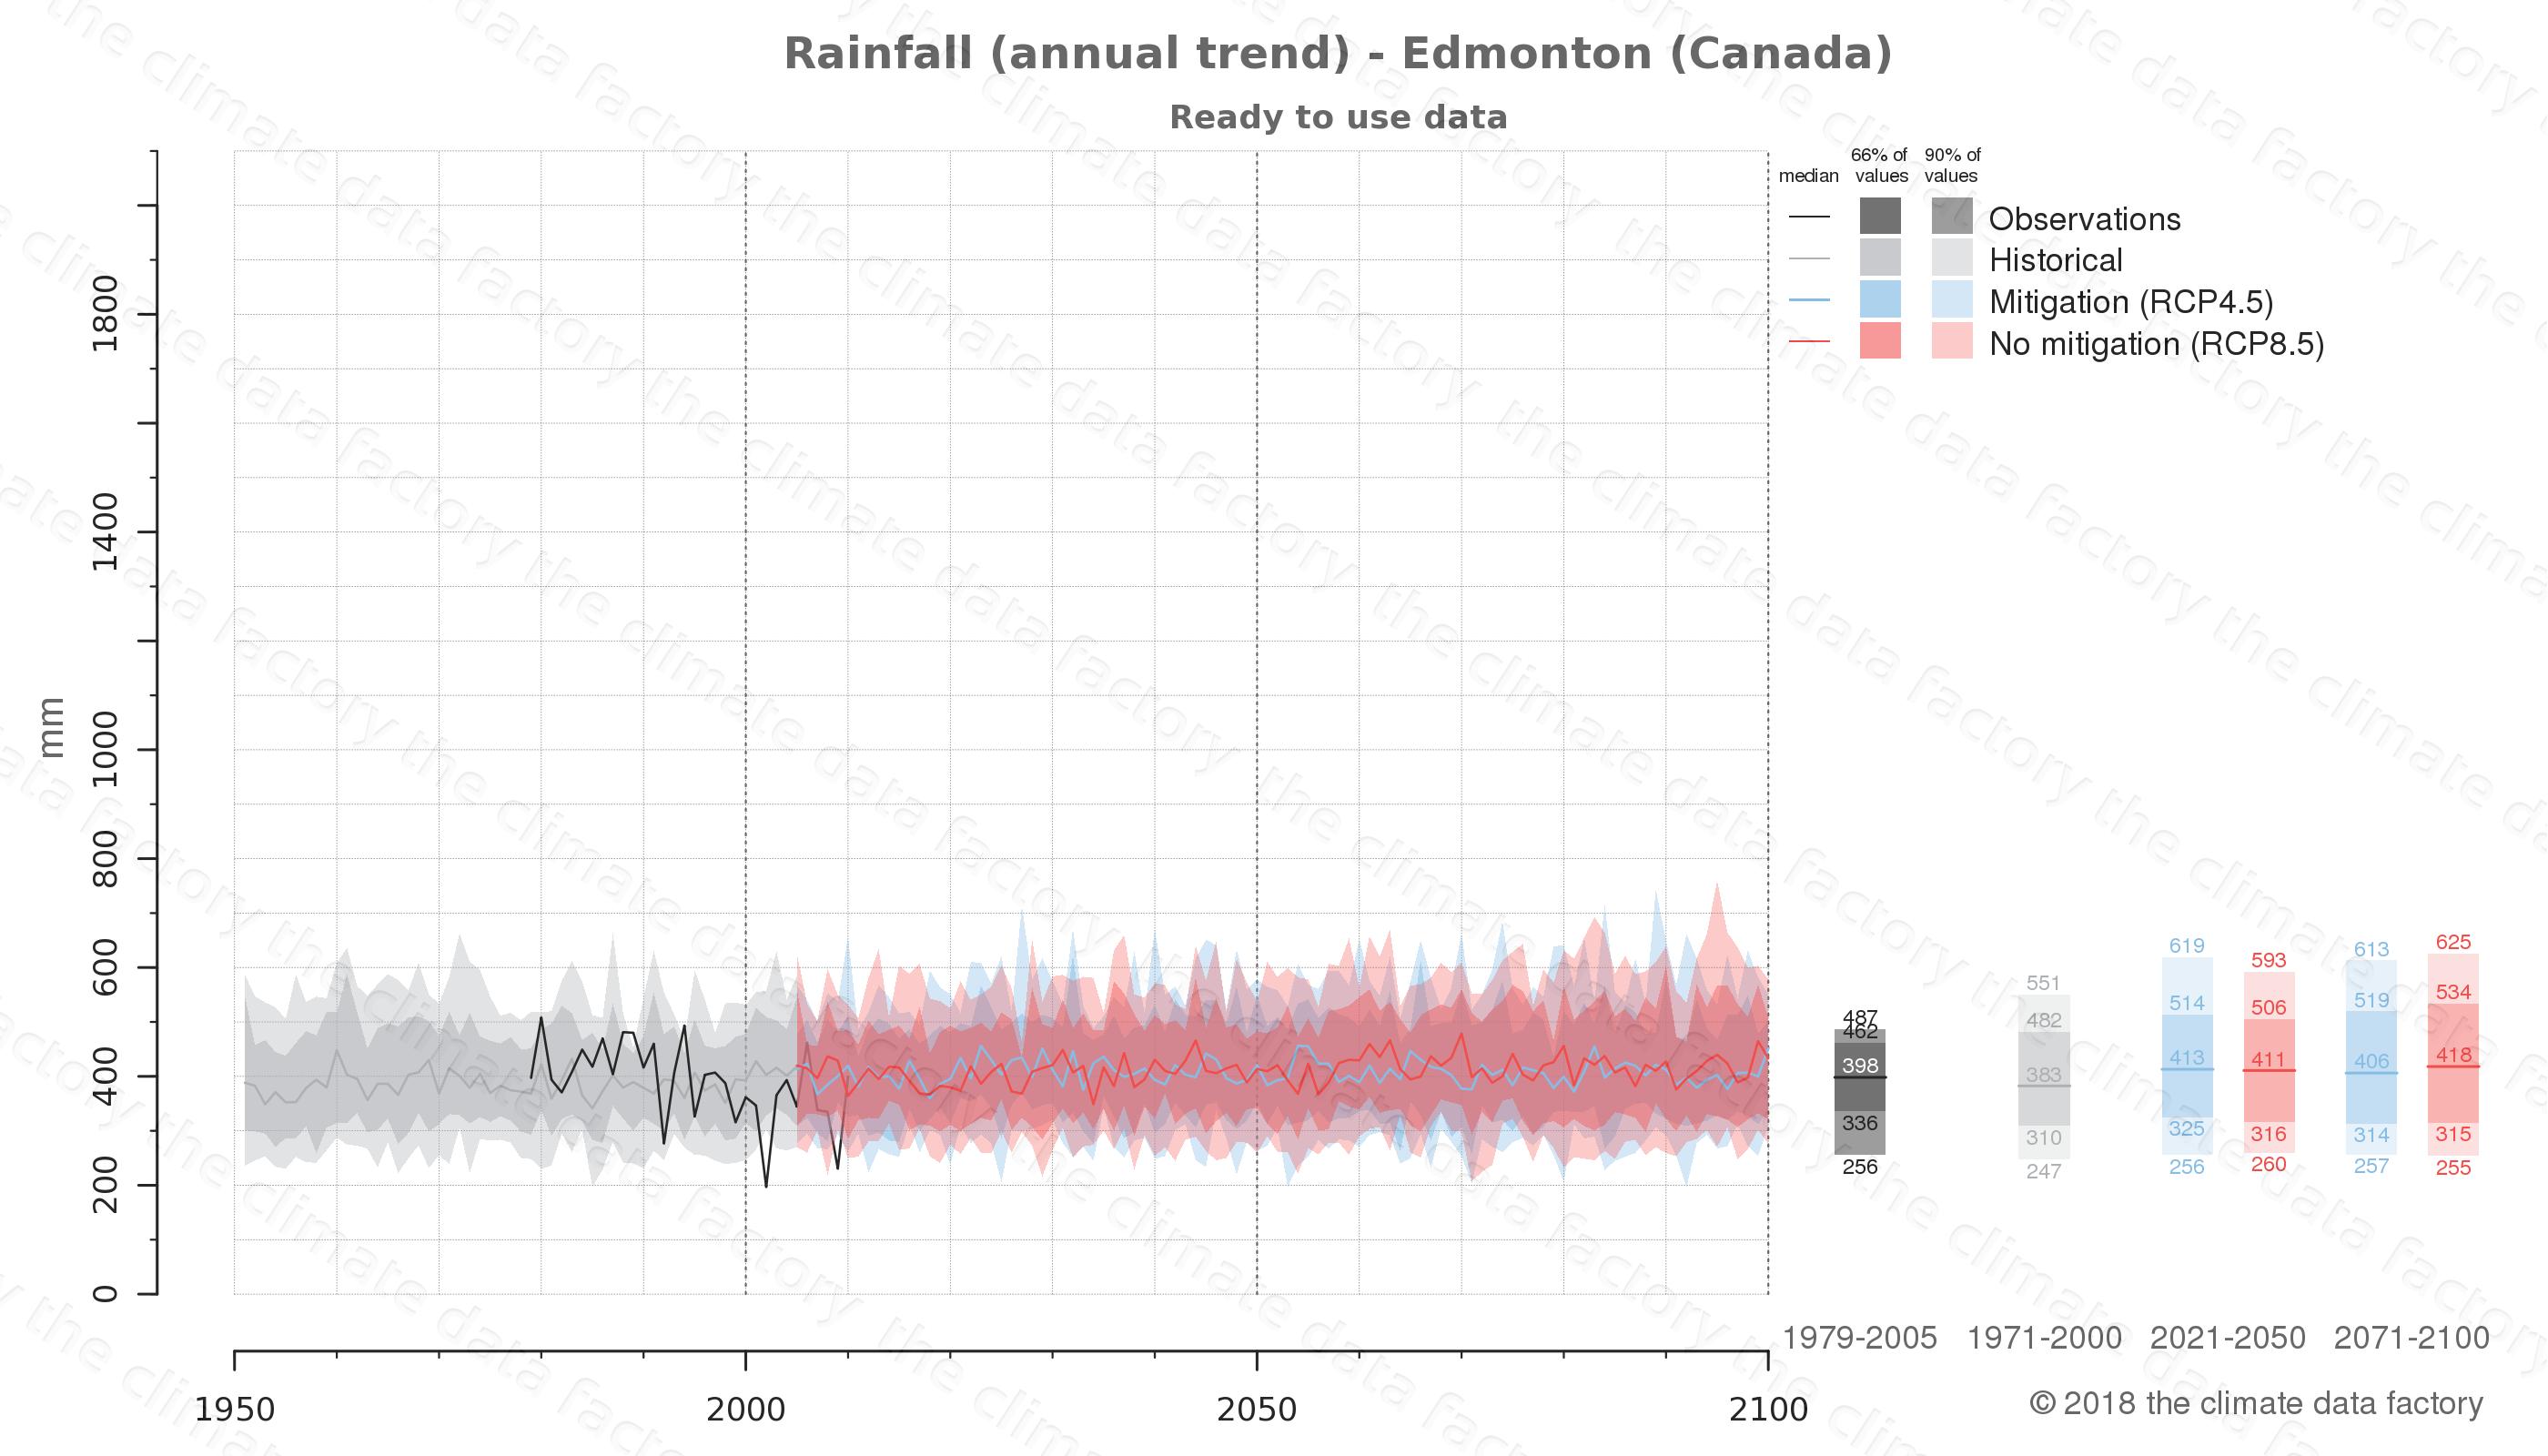 climate change data policy adaptation climate graph city data rainfall edmonton canada